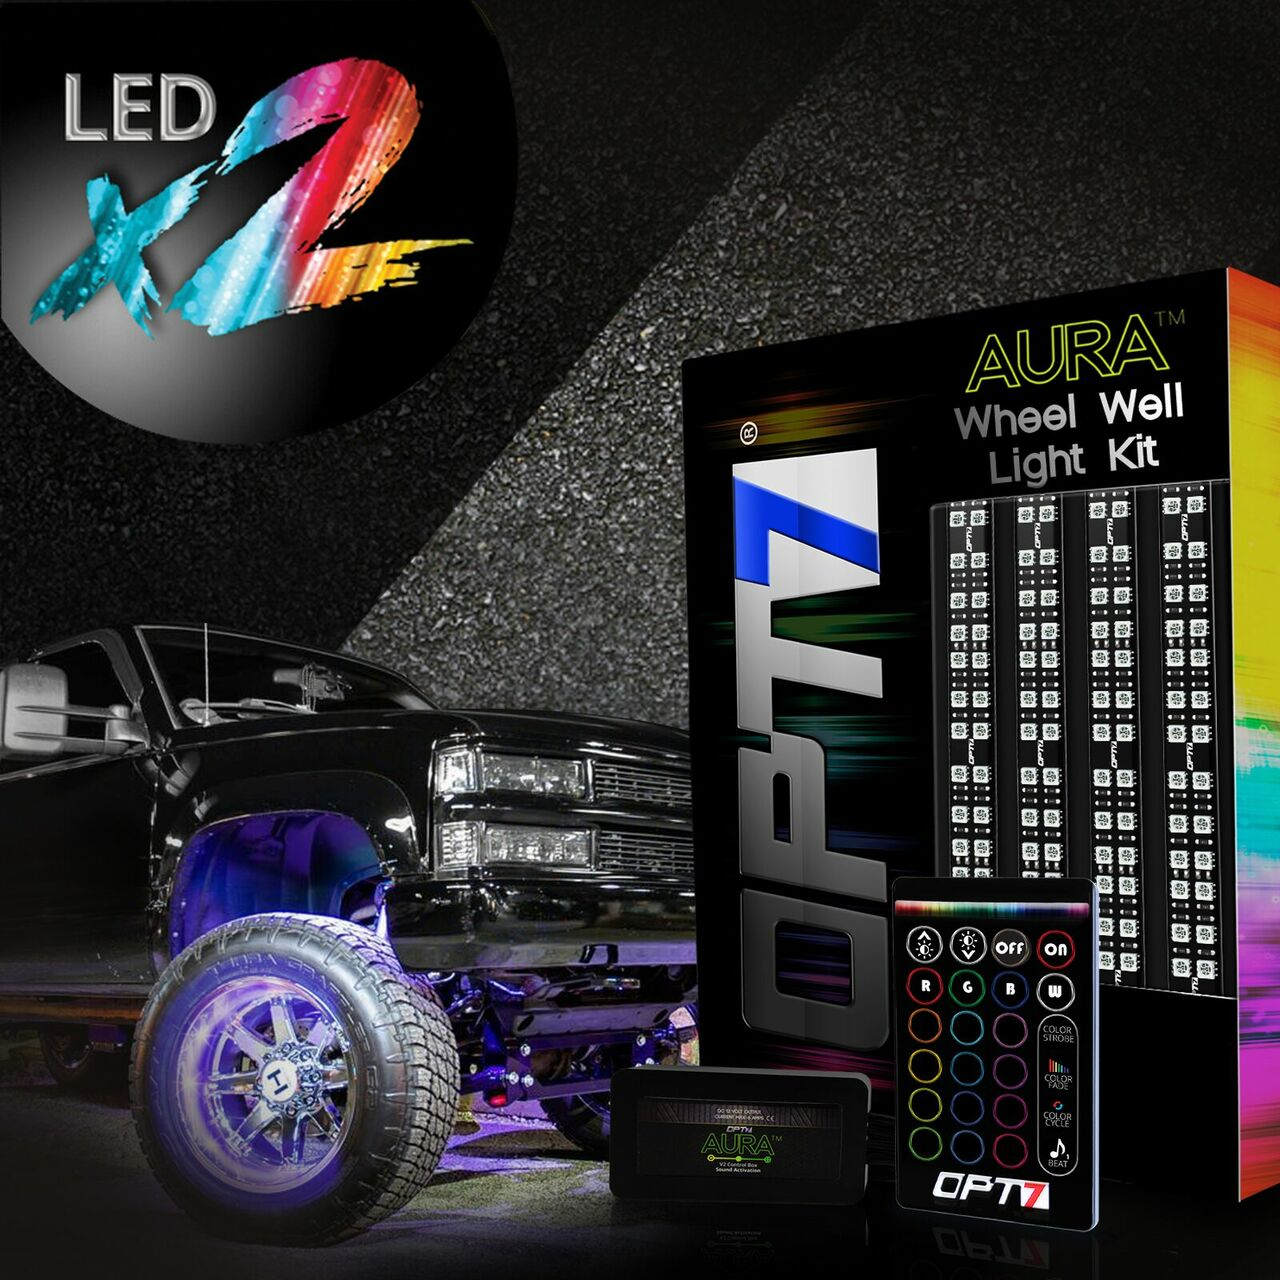 All-Color Strips w//SoundSync Single Row OPT7 3-Into-1 Aura Wheel Well LED Kit